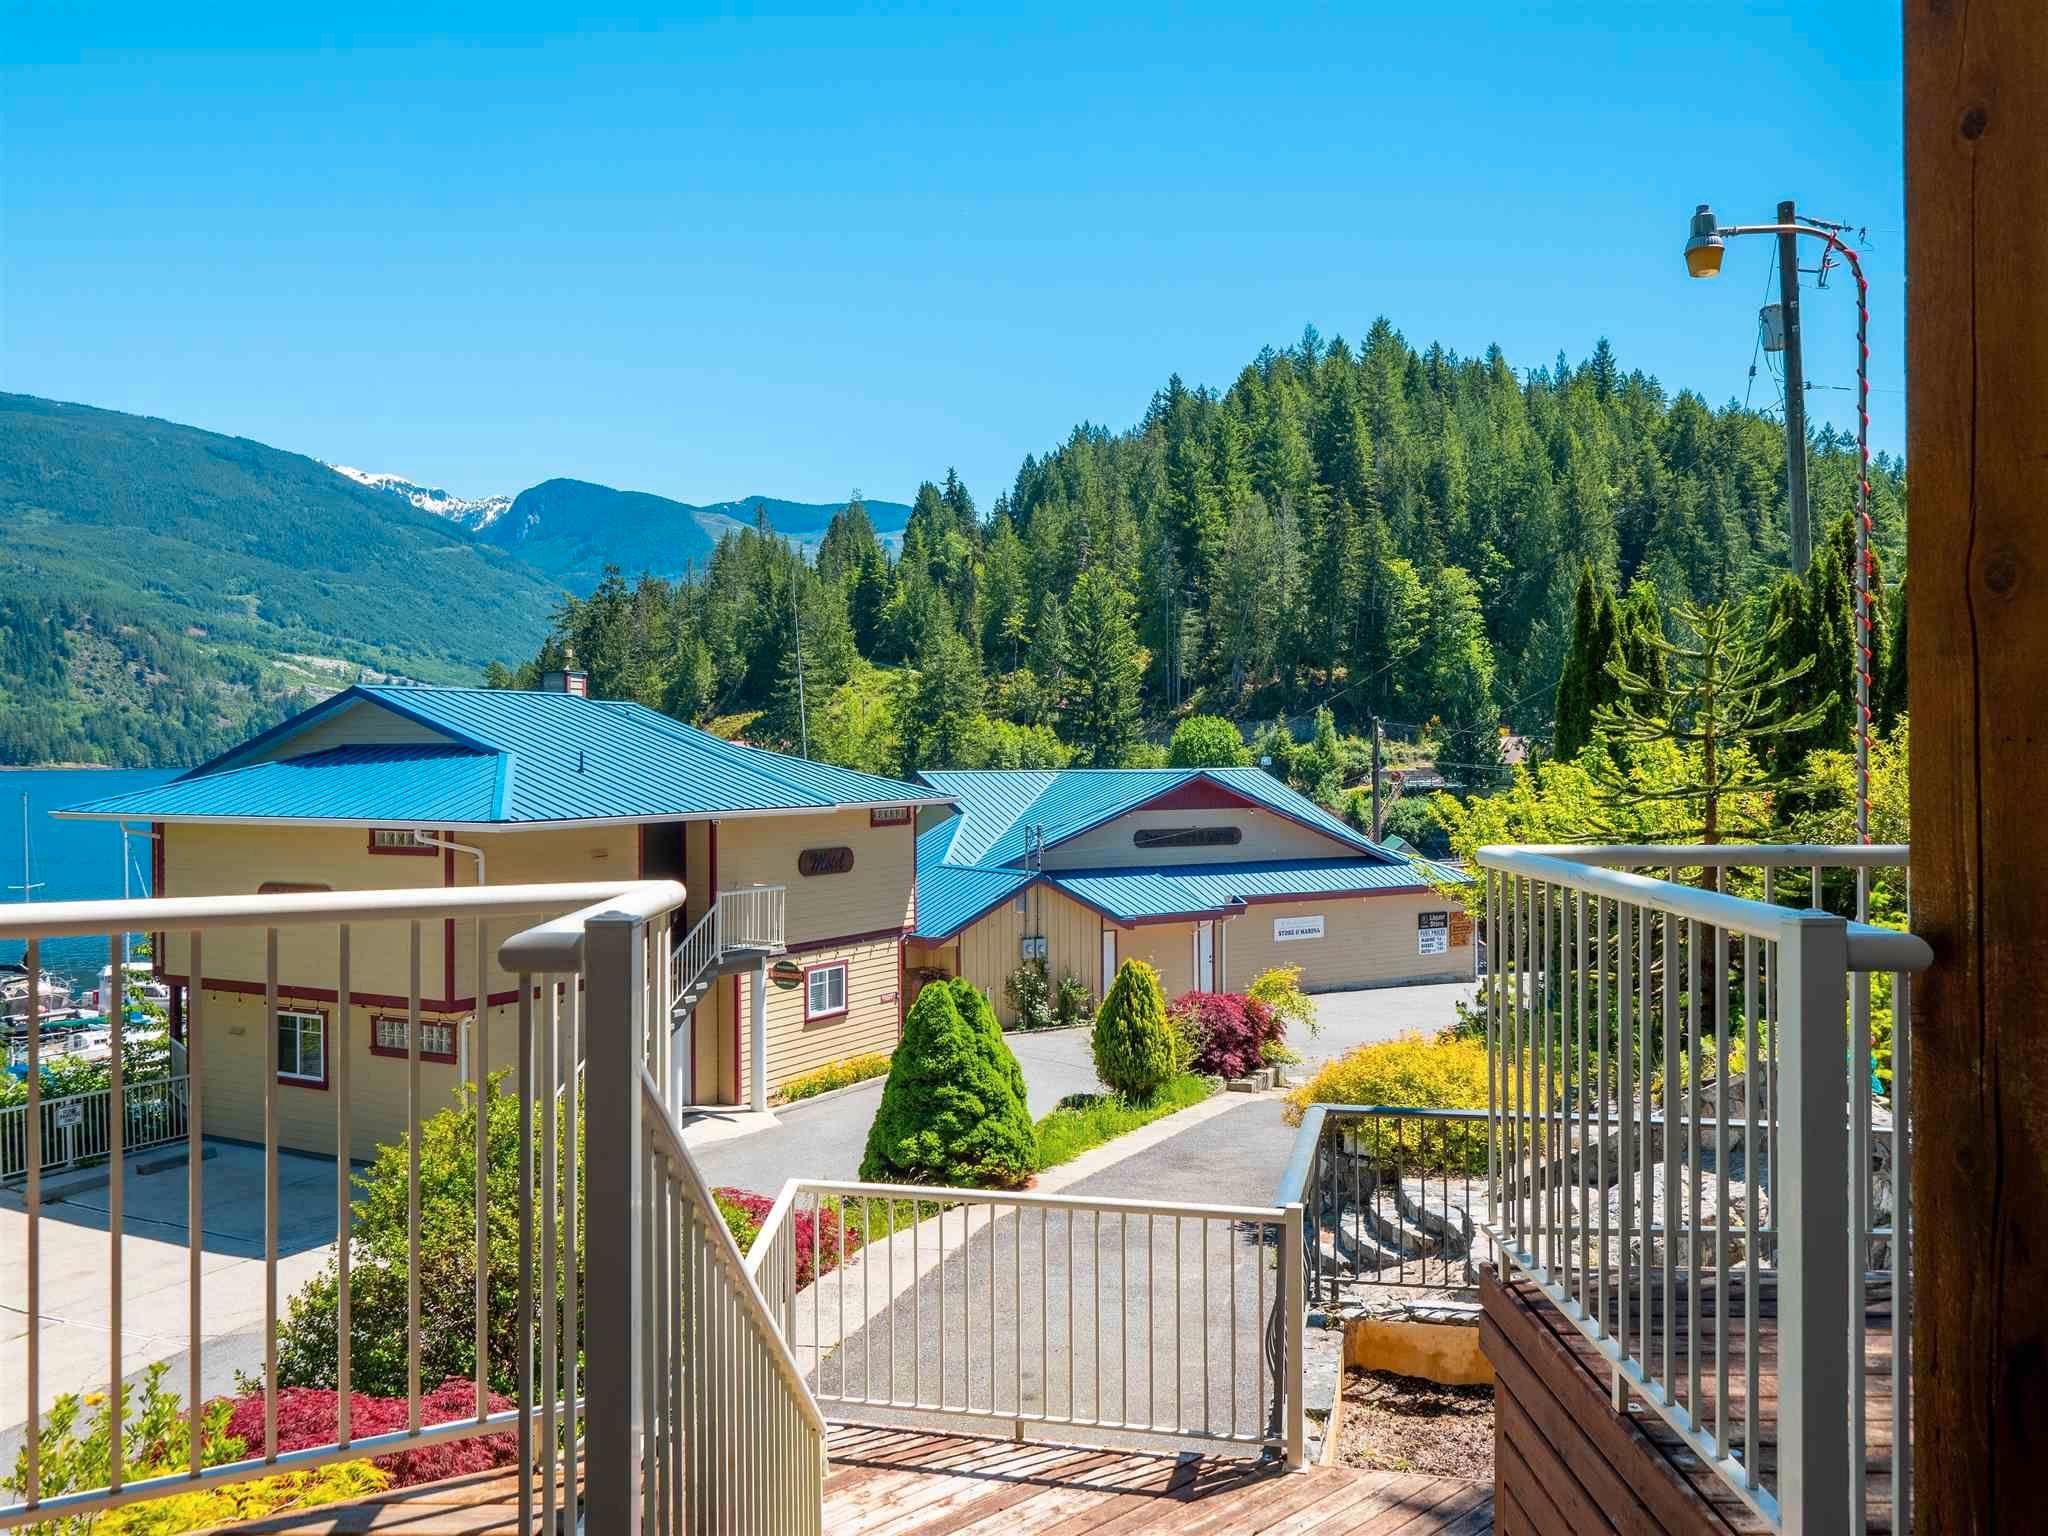 Photo 12: Photos: 6781 BATHGATE Road in Egmont: Pender Harbour Egmont House for sale (Sunshine Coast)  : MLS®# R2593981